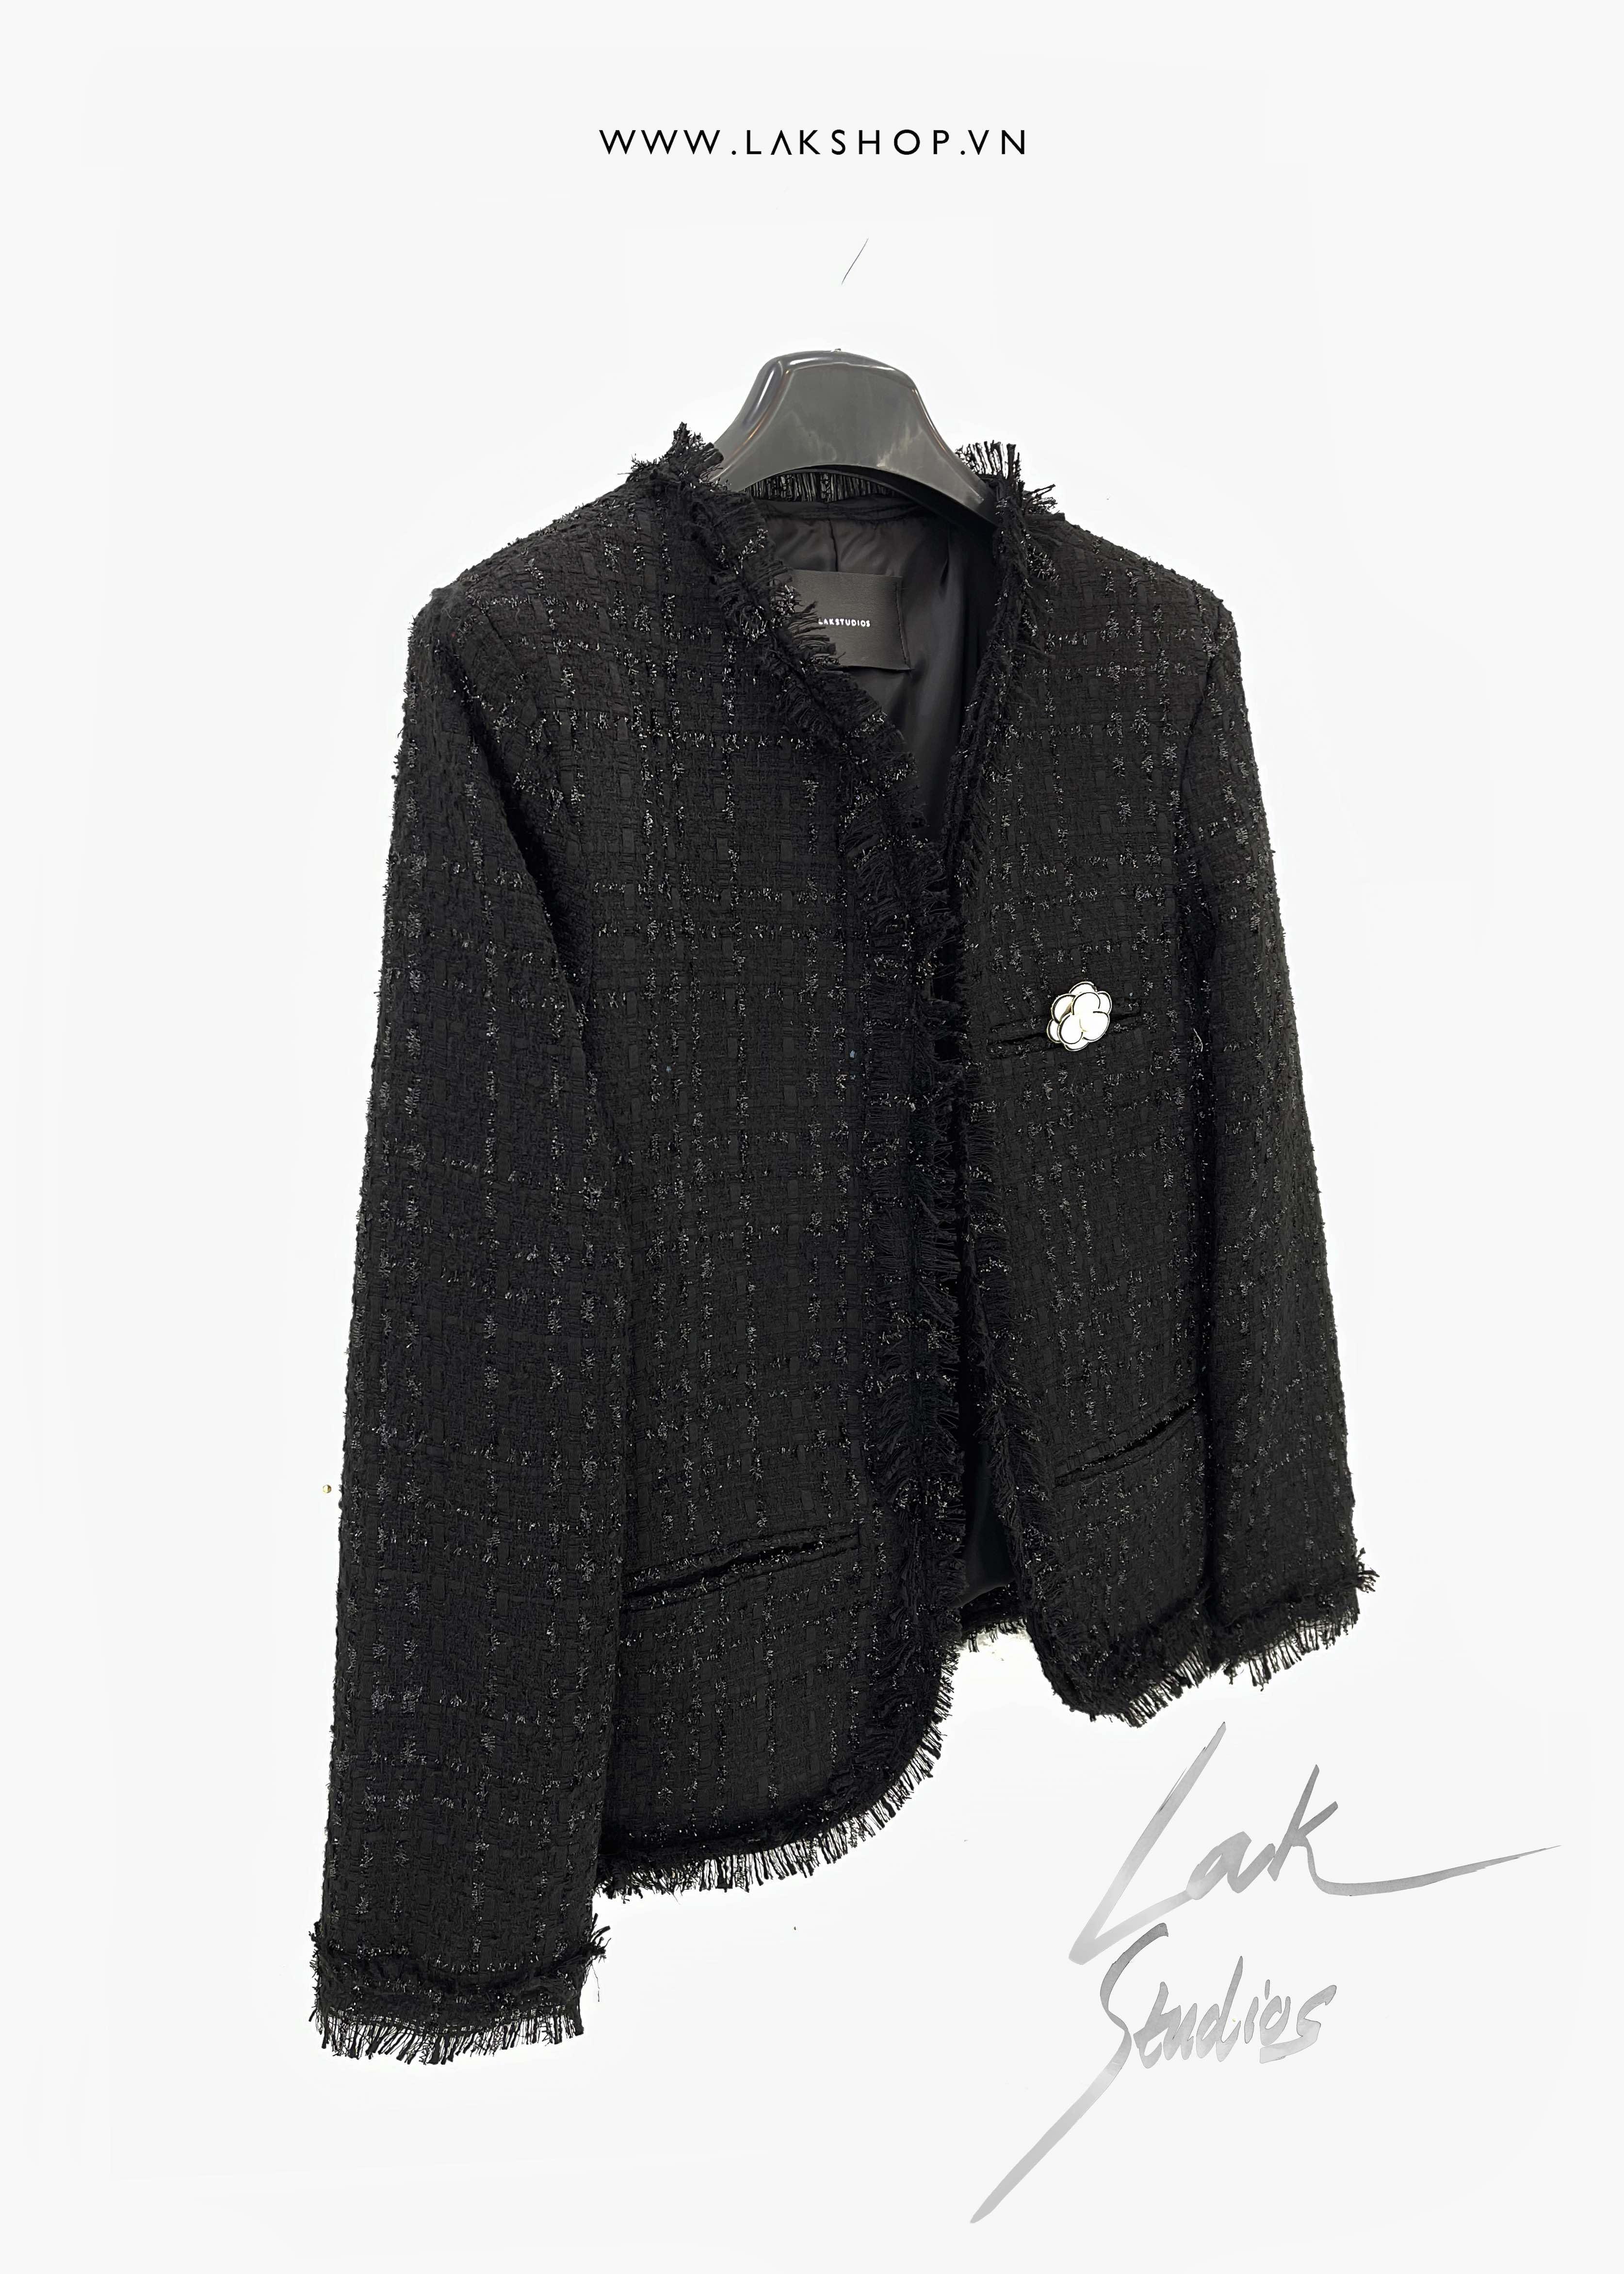 Peaceminusone Black HighnNeck Logo Oversized Sweatshirt